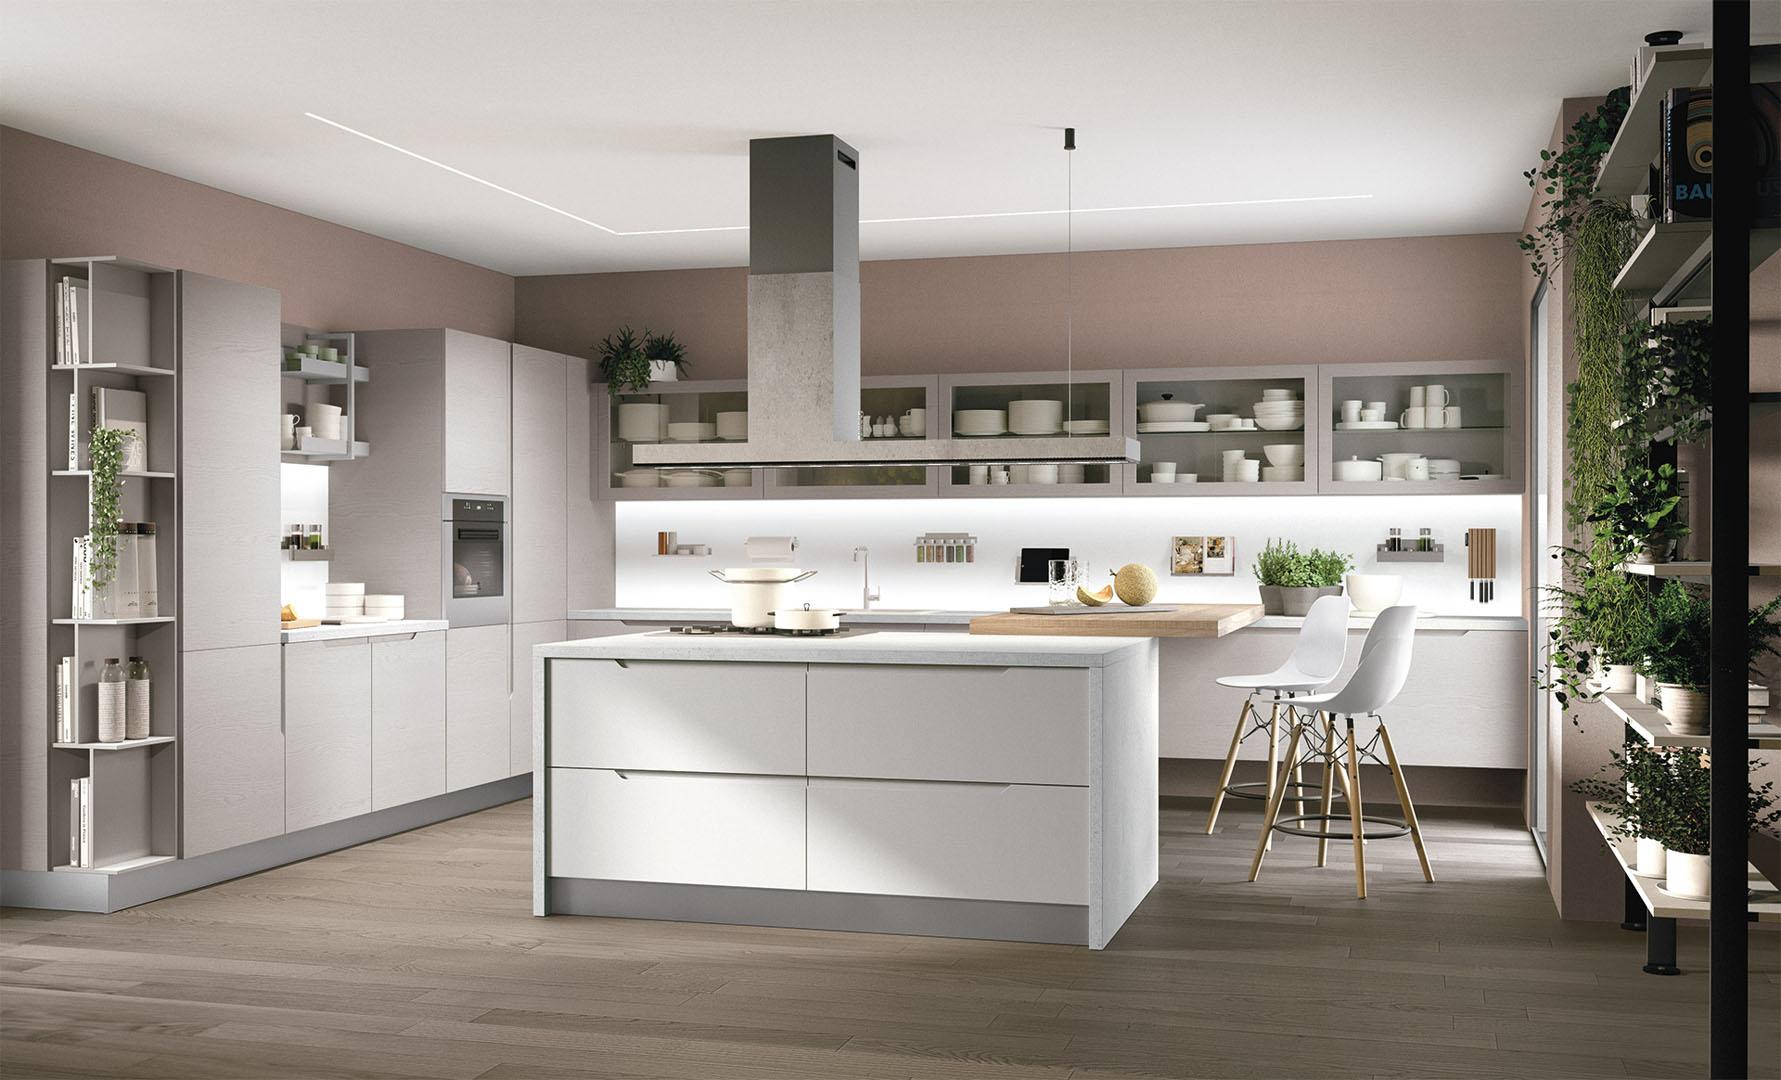 Catalogo Cucine Lube Moderne.Luna Cucine Moderne Cucine Lube